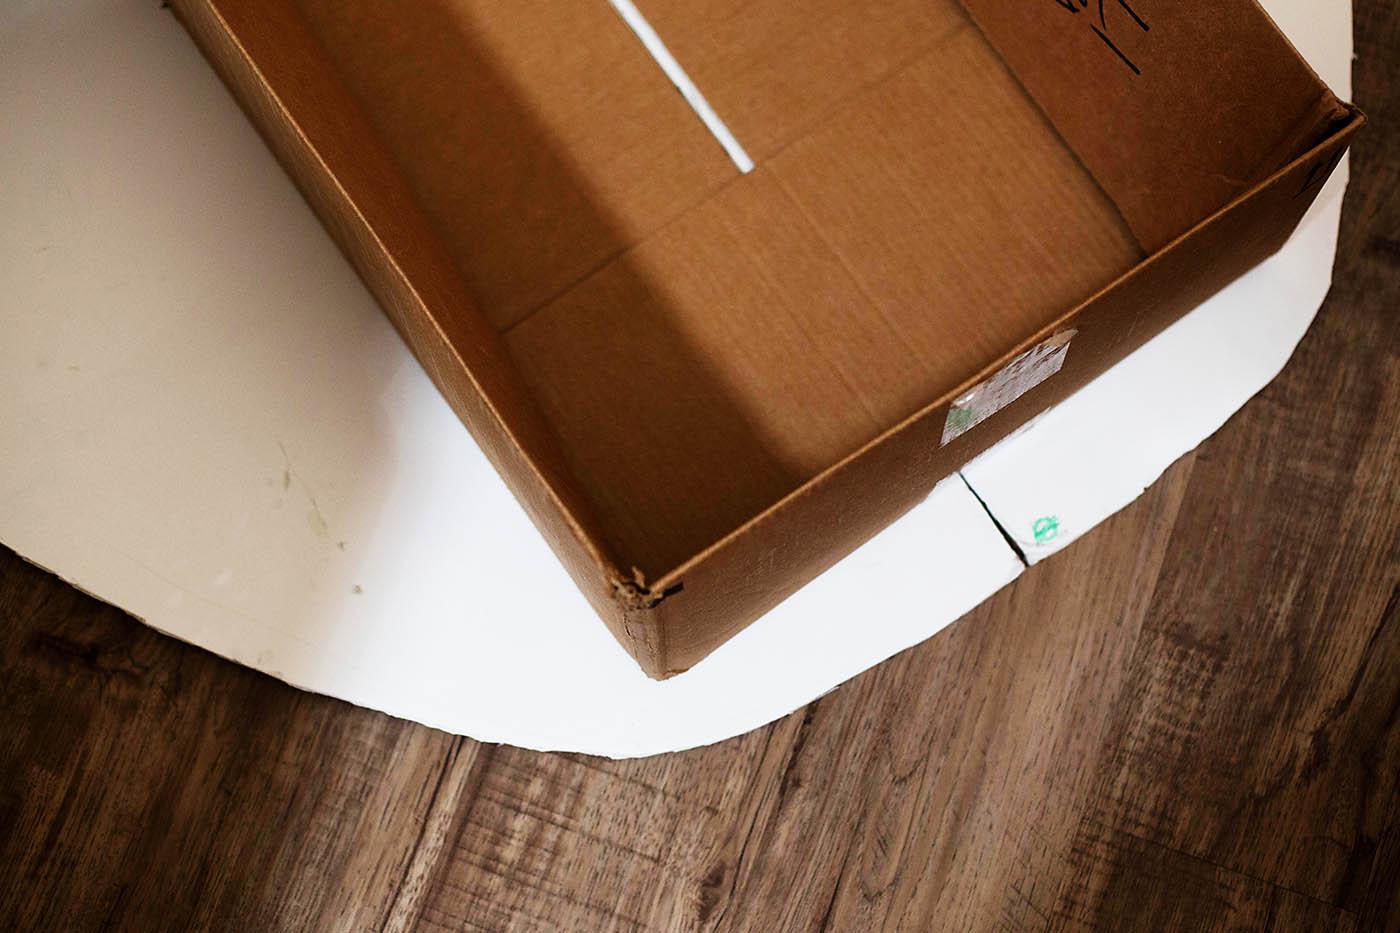 How to build a cardboard Millennium Falcon